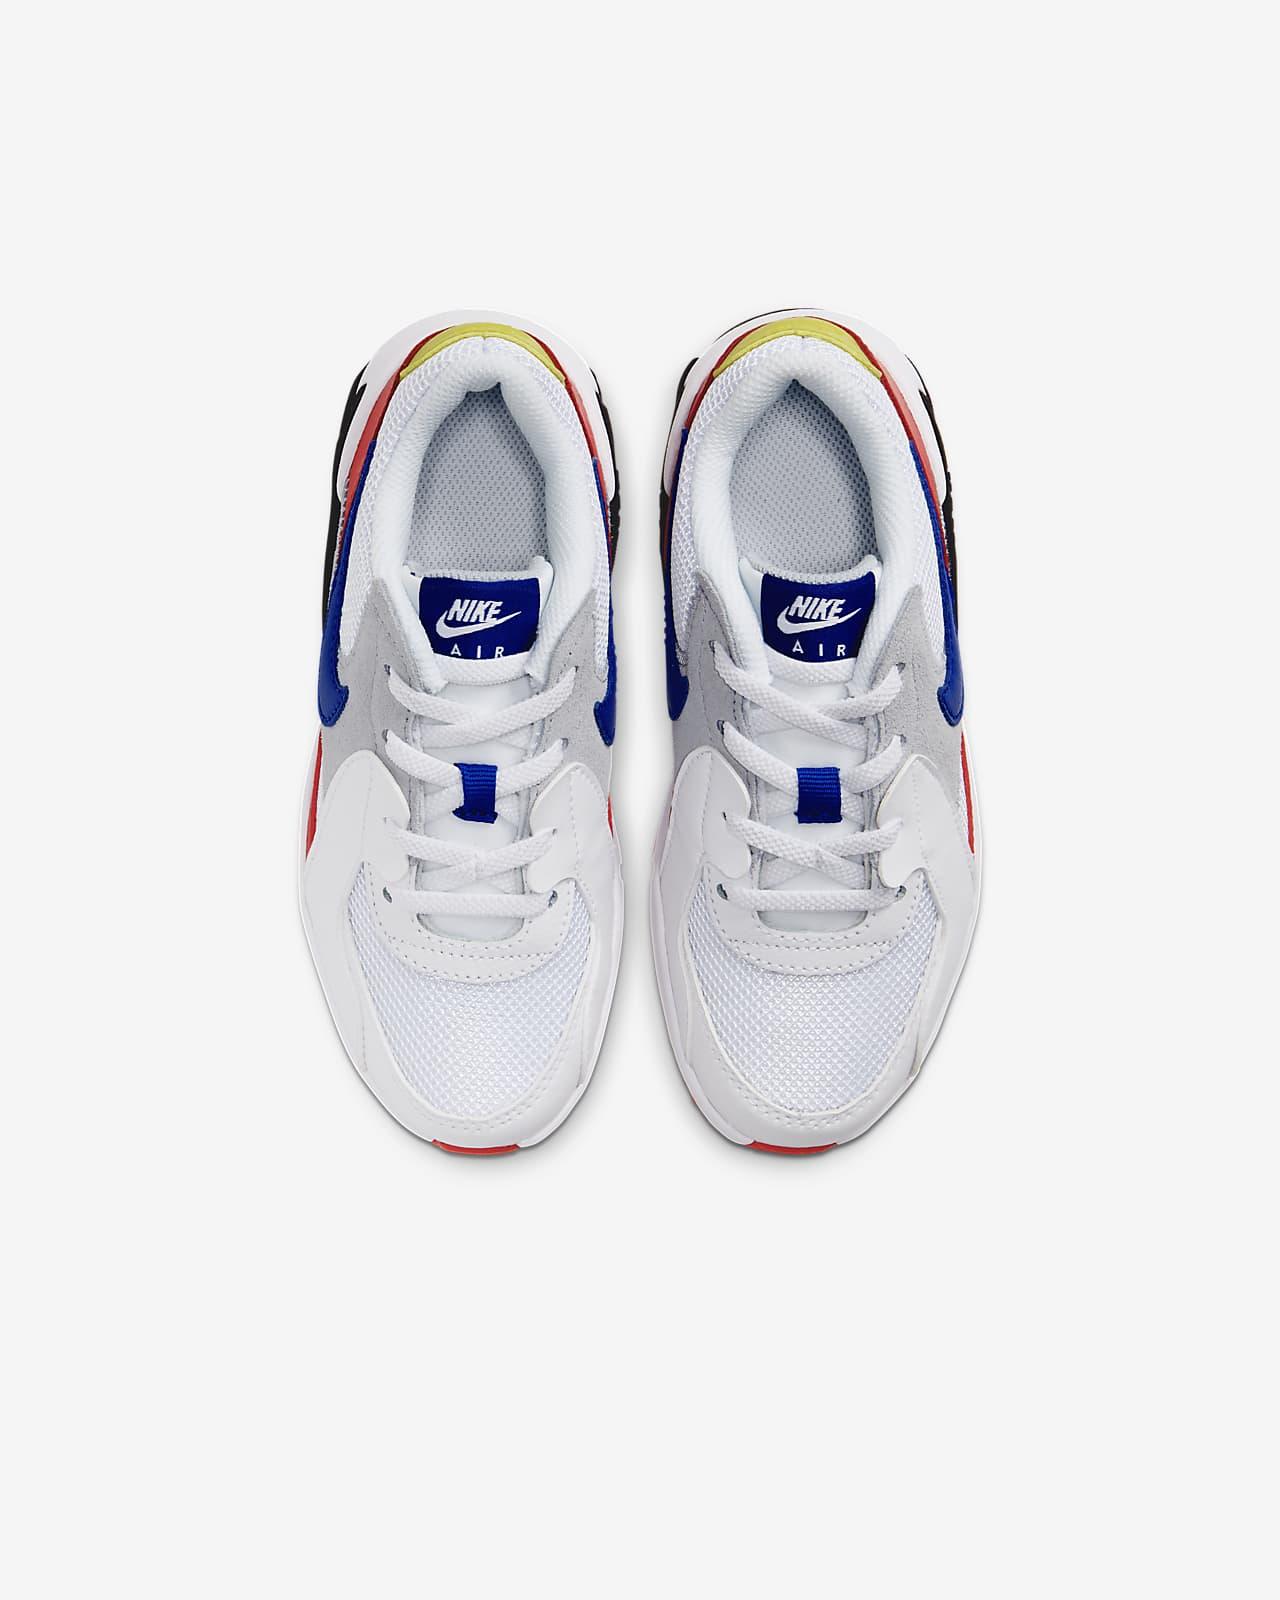 nike zapatos niños runing de 13 anos